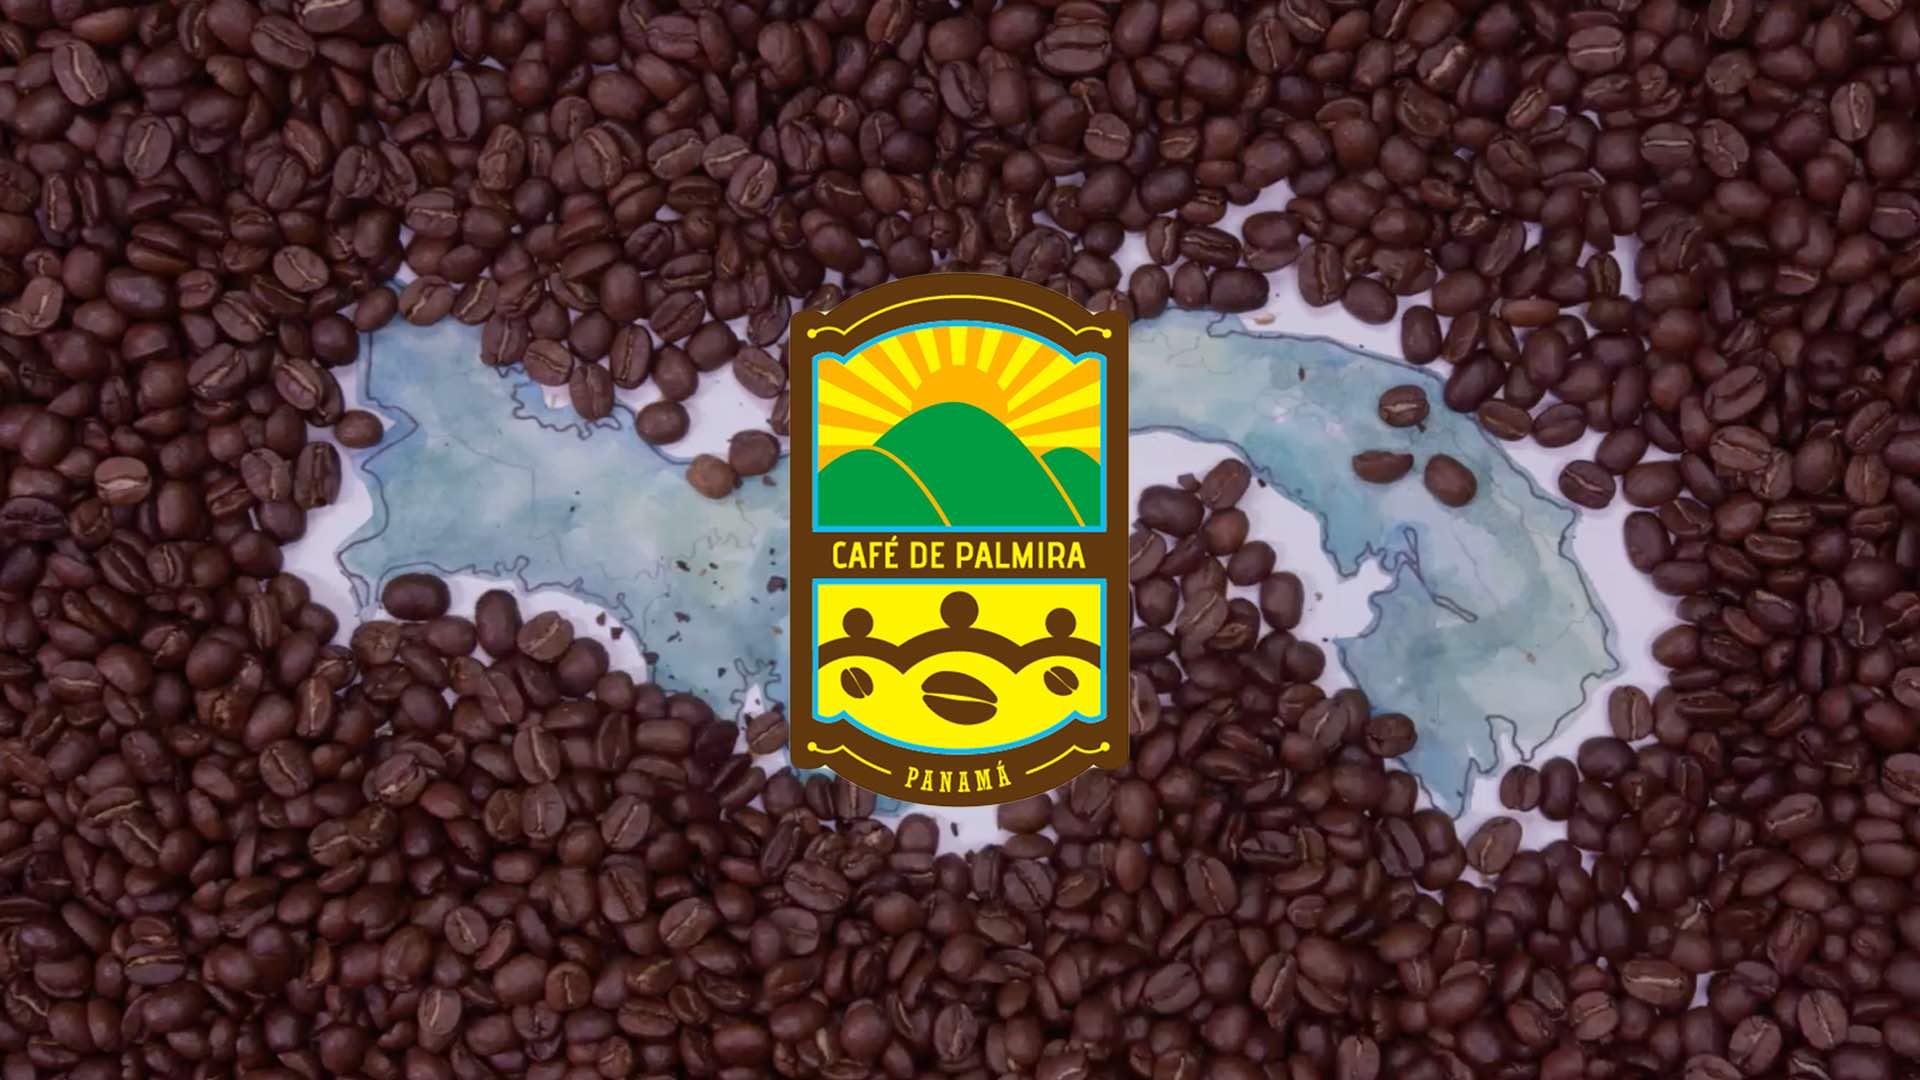 Café de Palmira